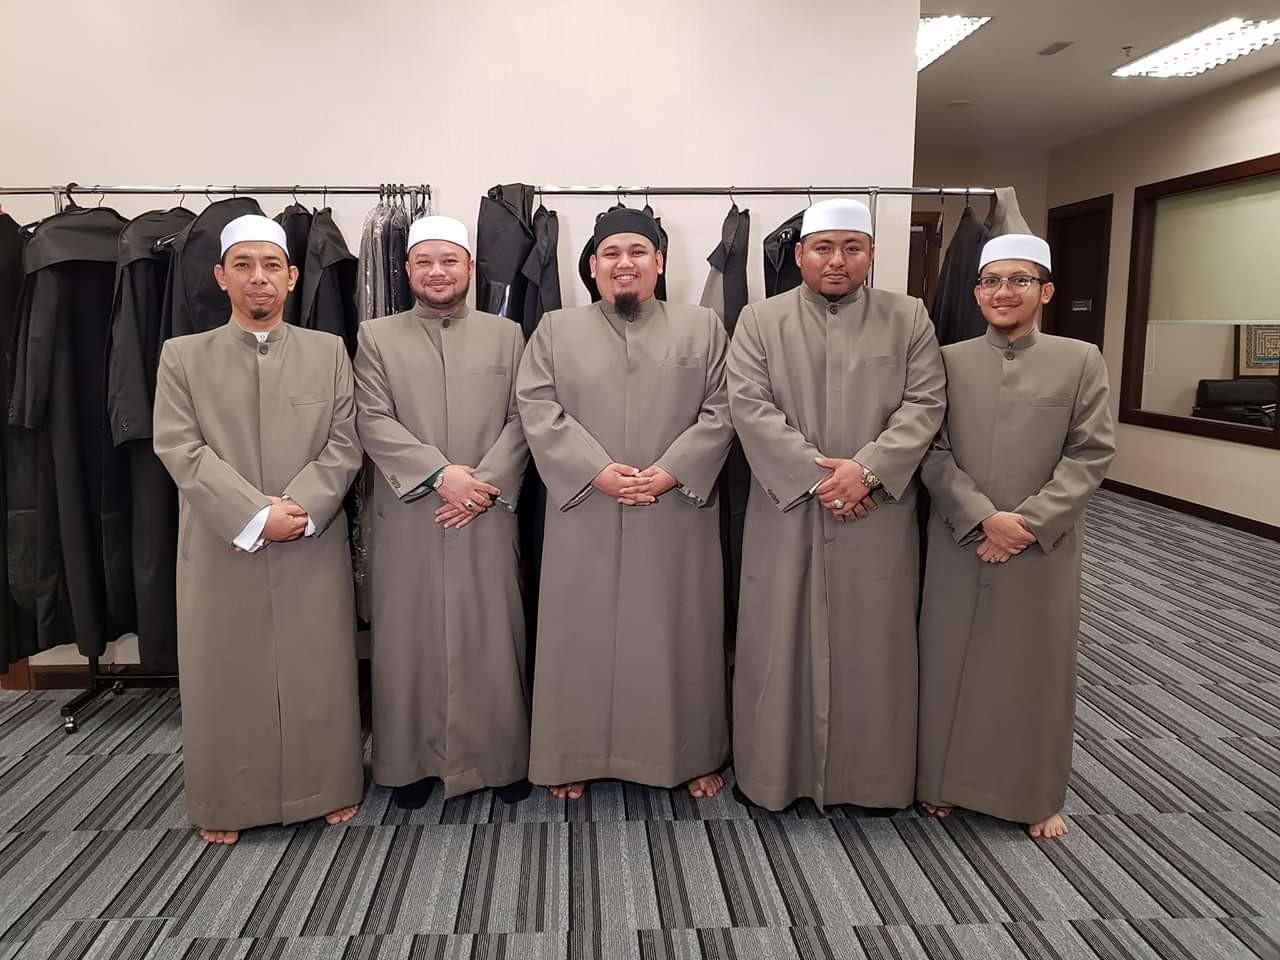 imam thobe tempahan jubah imam coat Masjid Sultan Salahudin Abdul Aziz Shah, Masjid Negeri